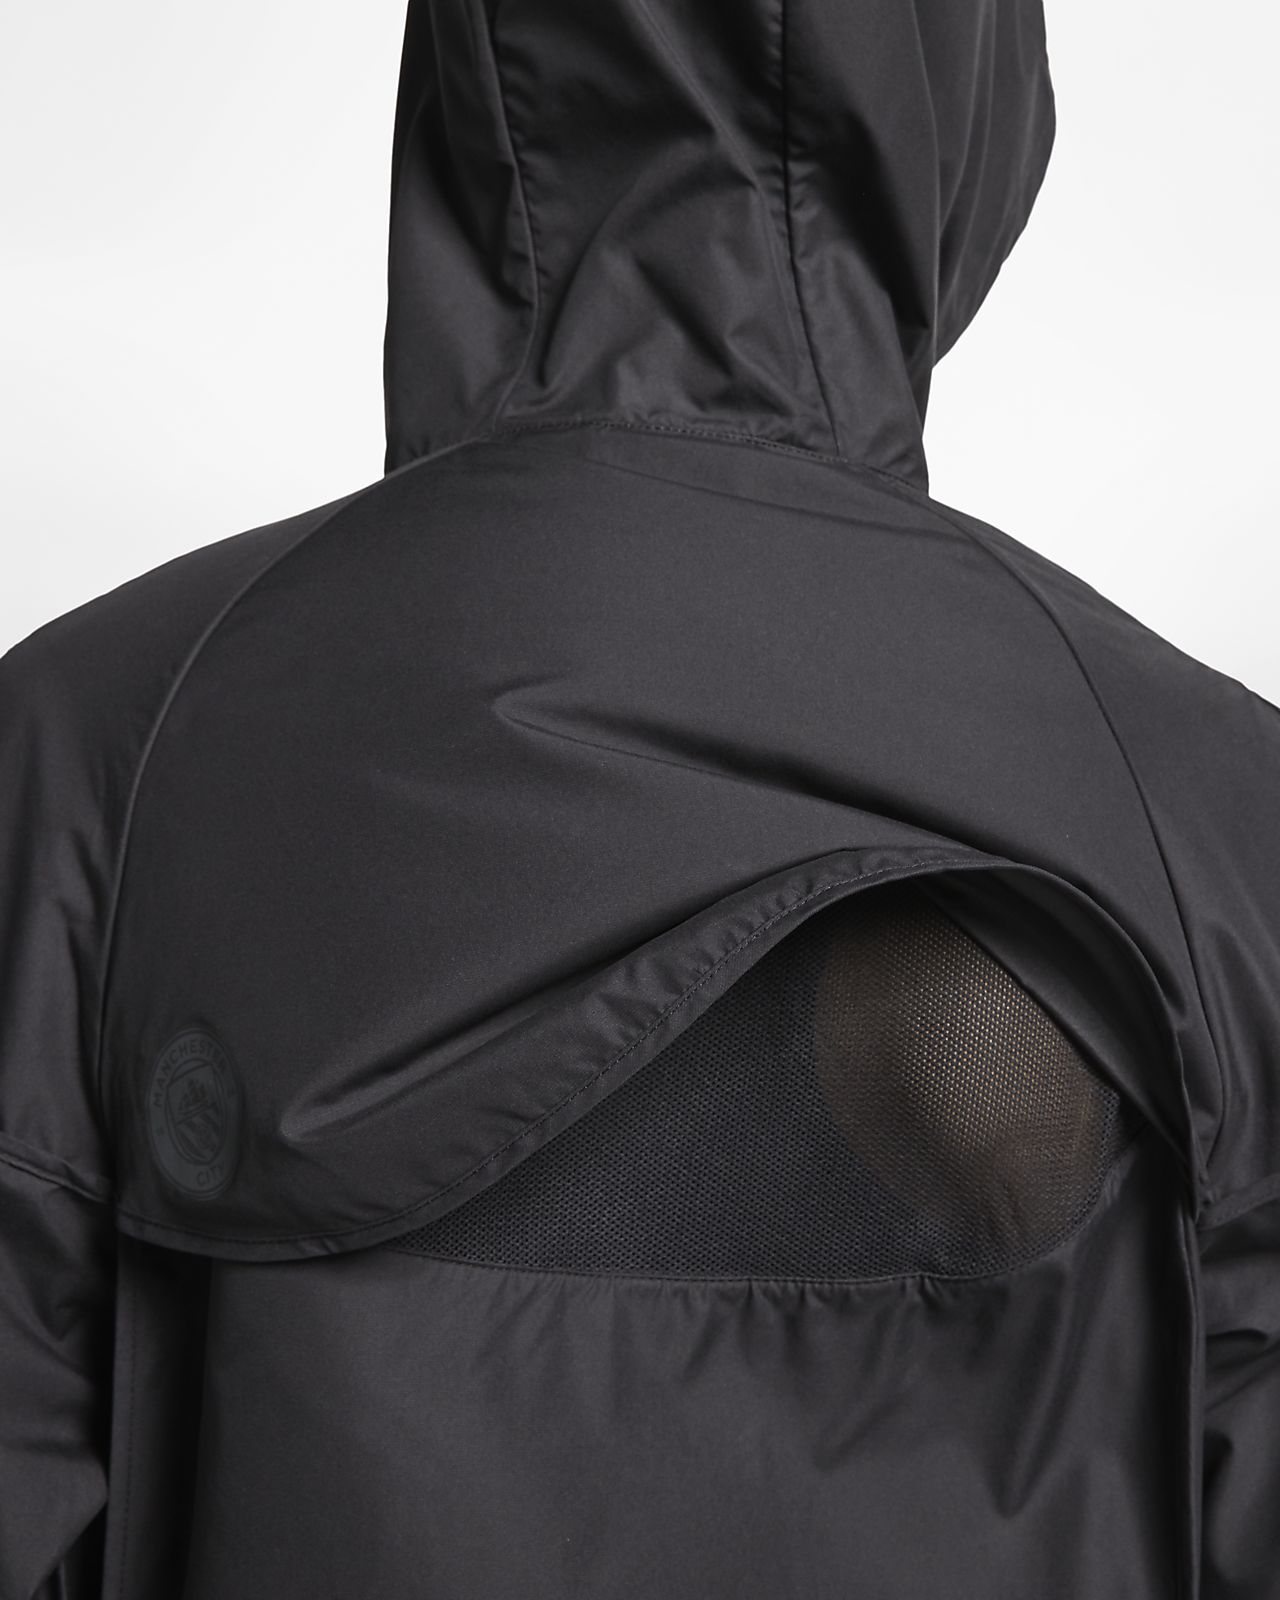 88a890091b82 Manchester City FC Windrunner Women s Jacket. Nike.com GB